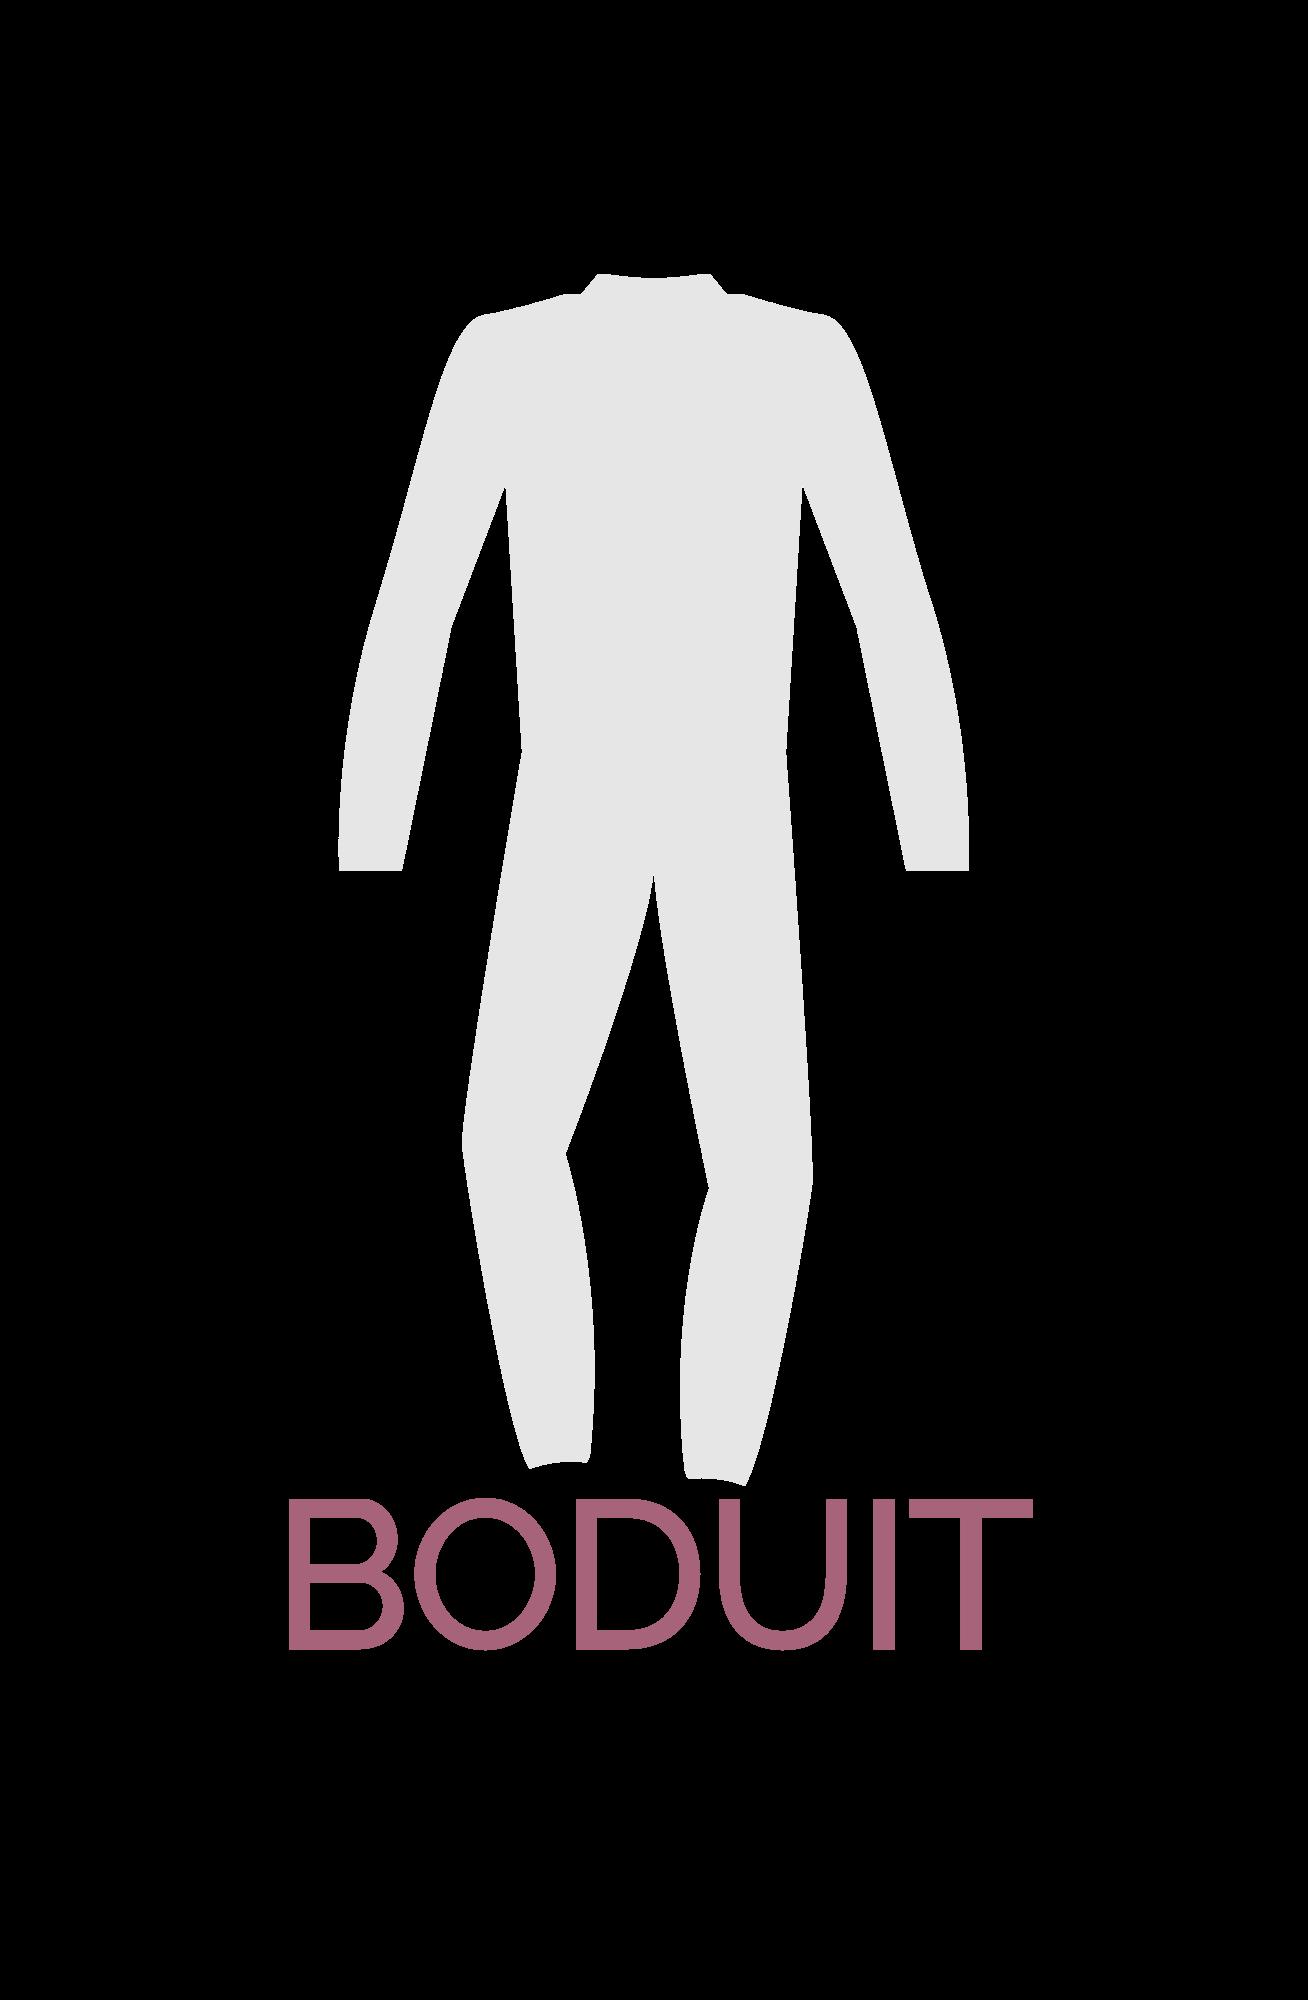 Copy of Copy of BODUIT